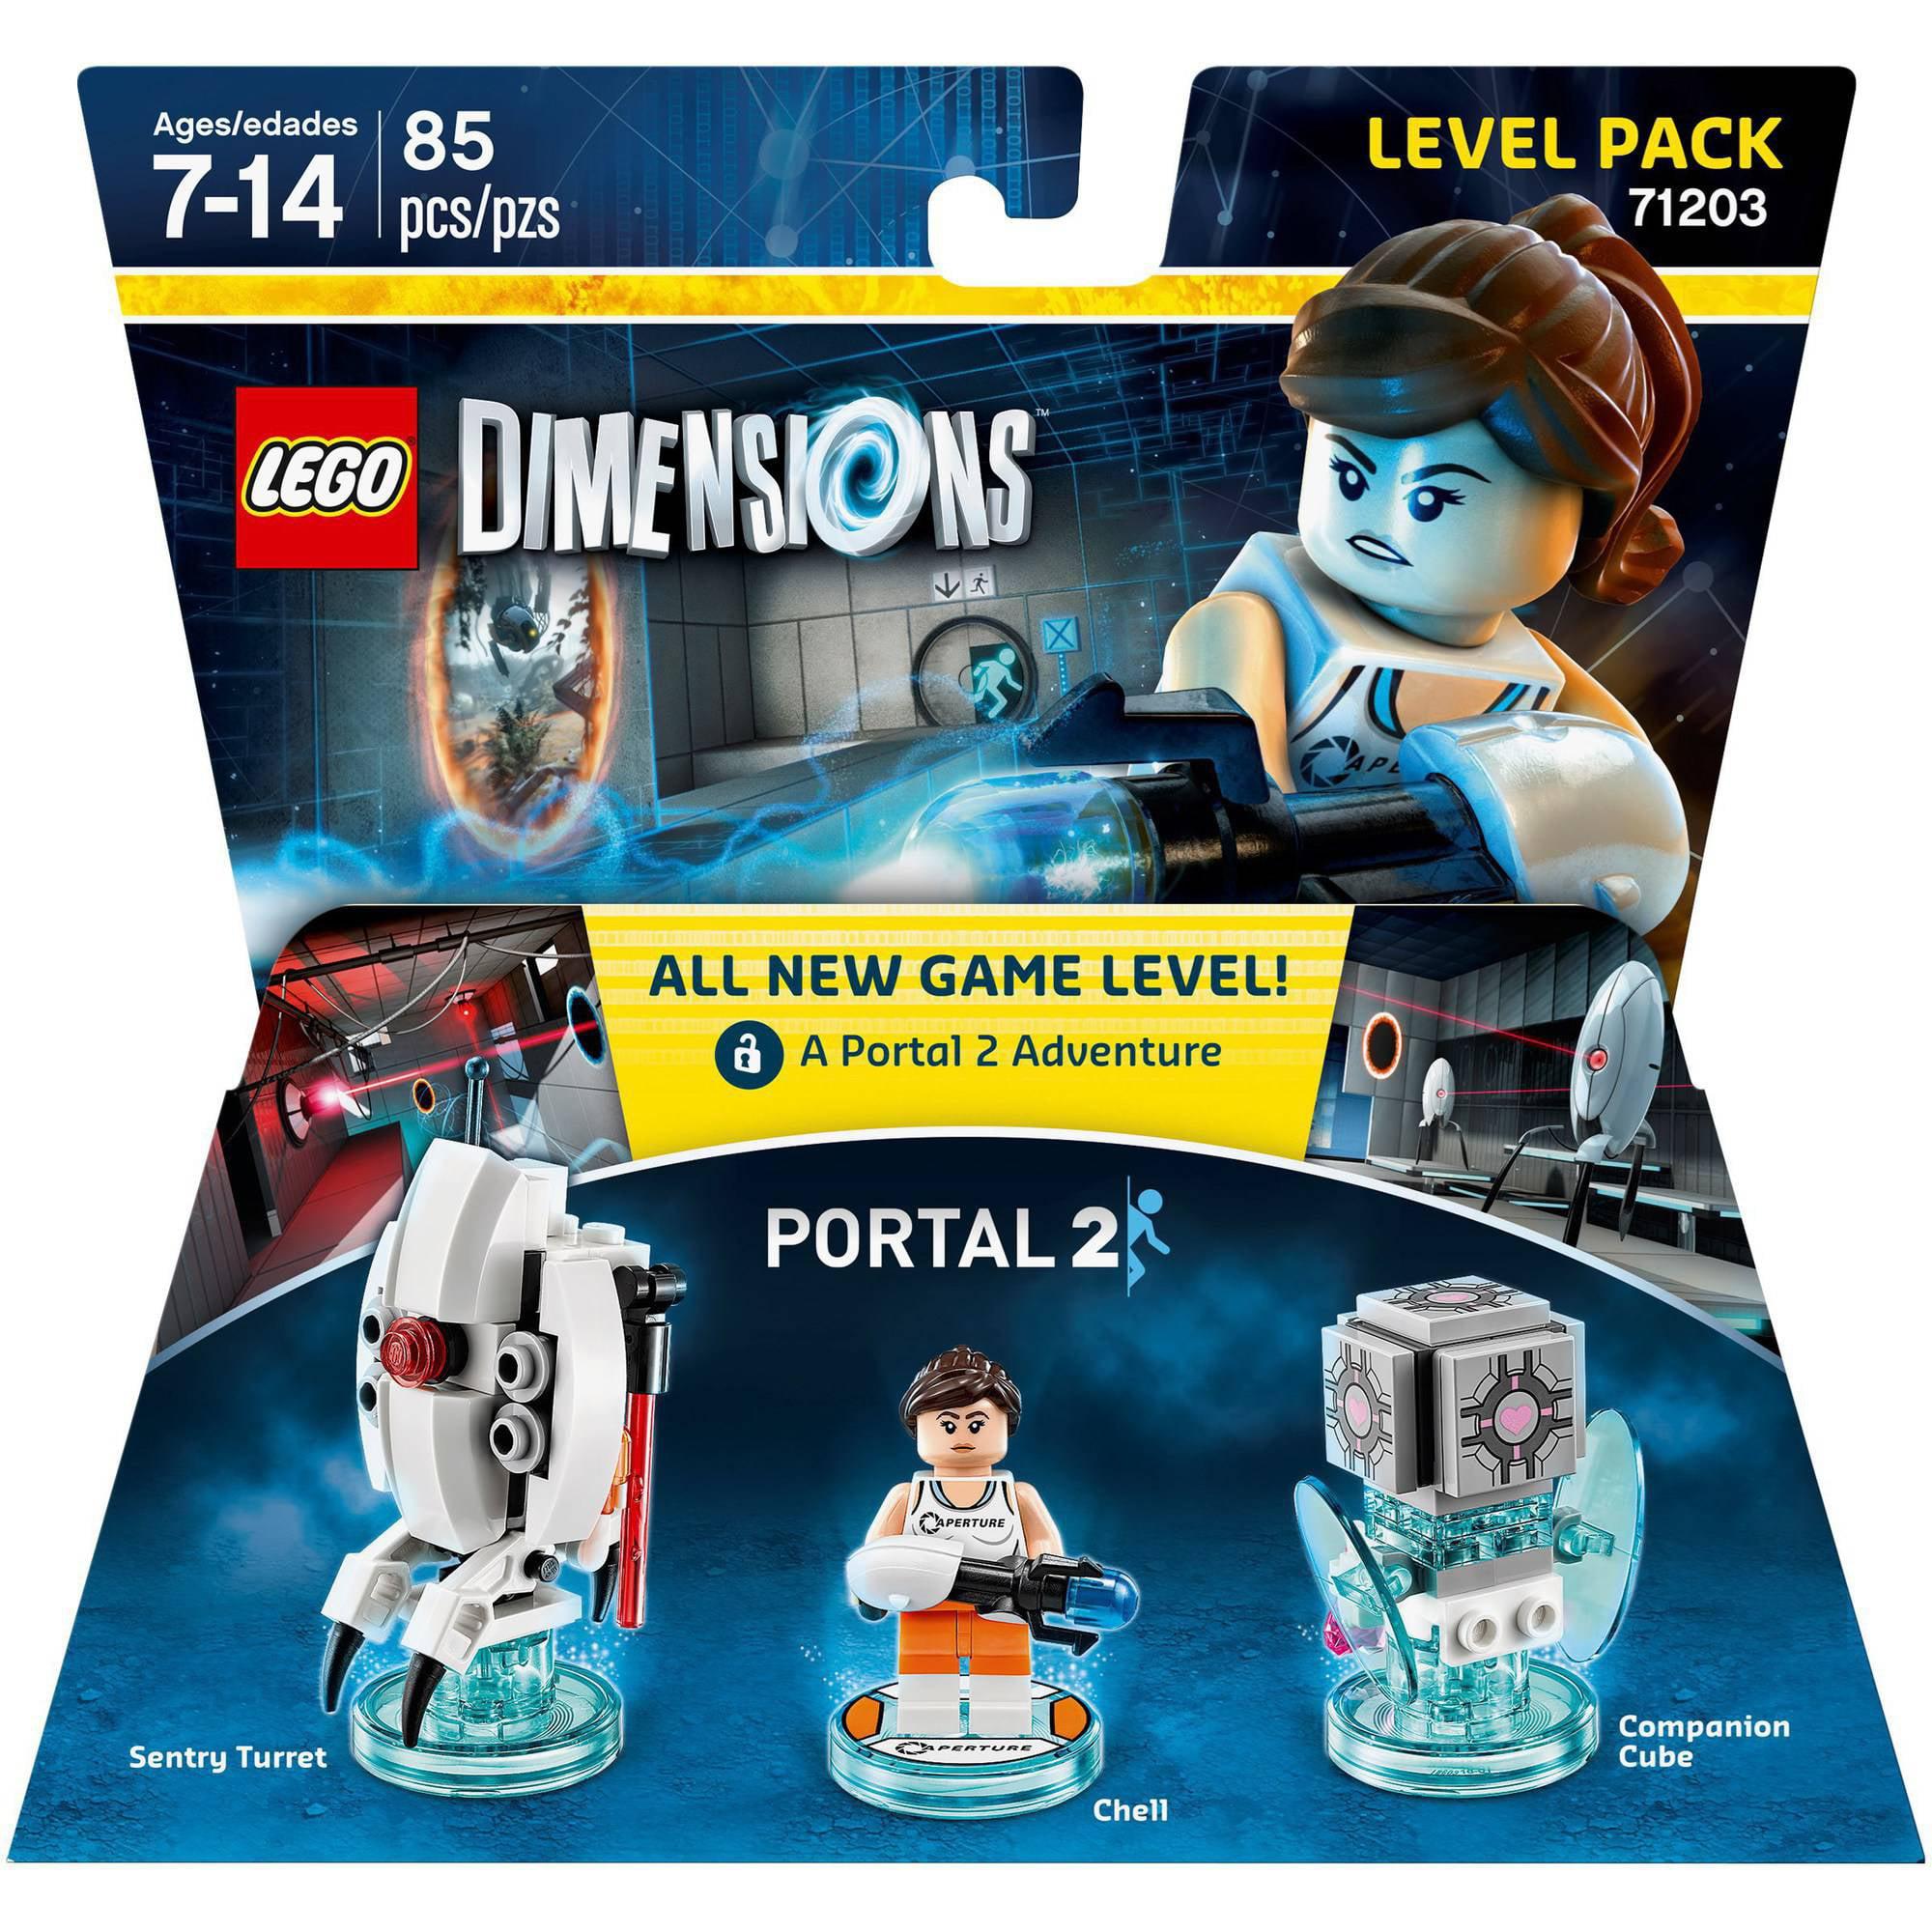 LEGO Dimensions Portal Level Pack (Universal) - Walmart.com